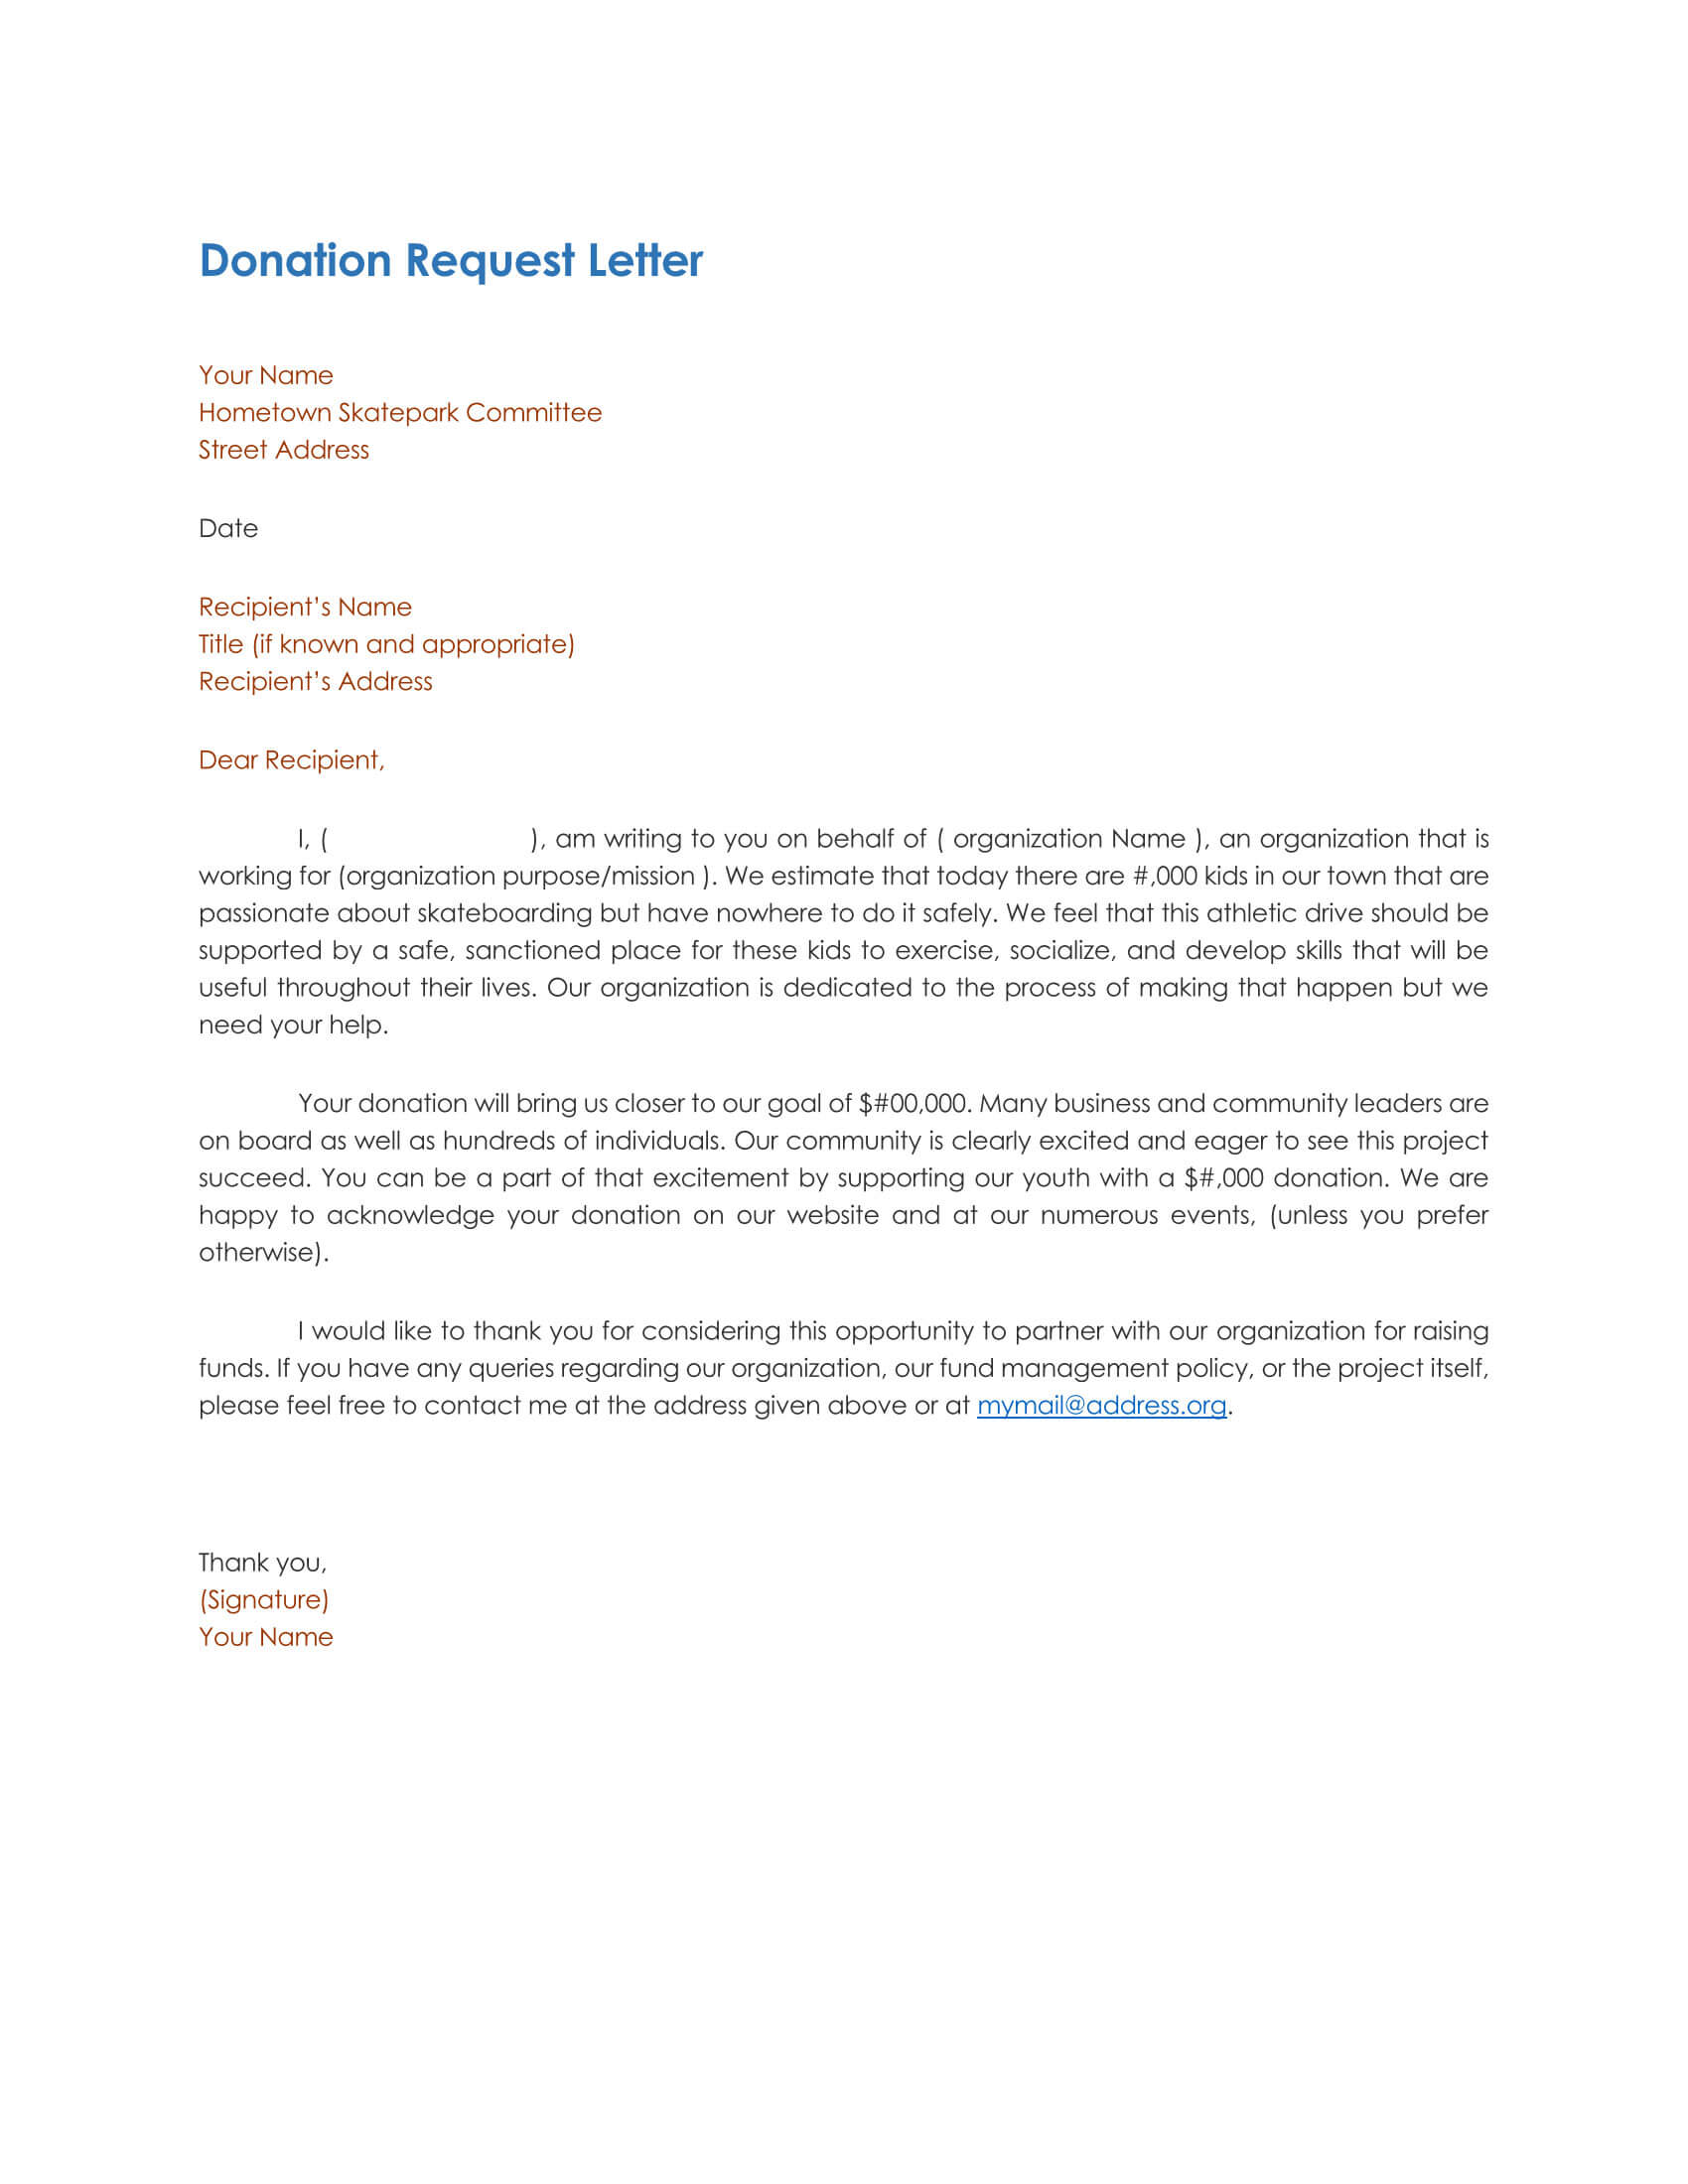 Donation Request Letter 06